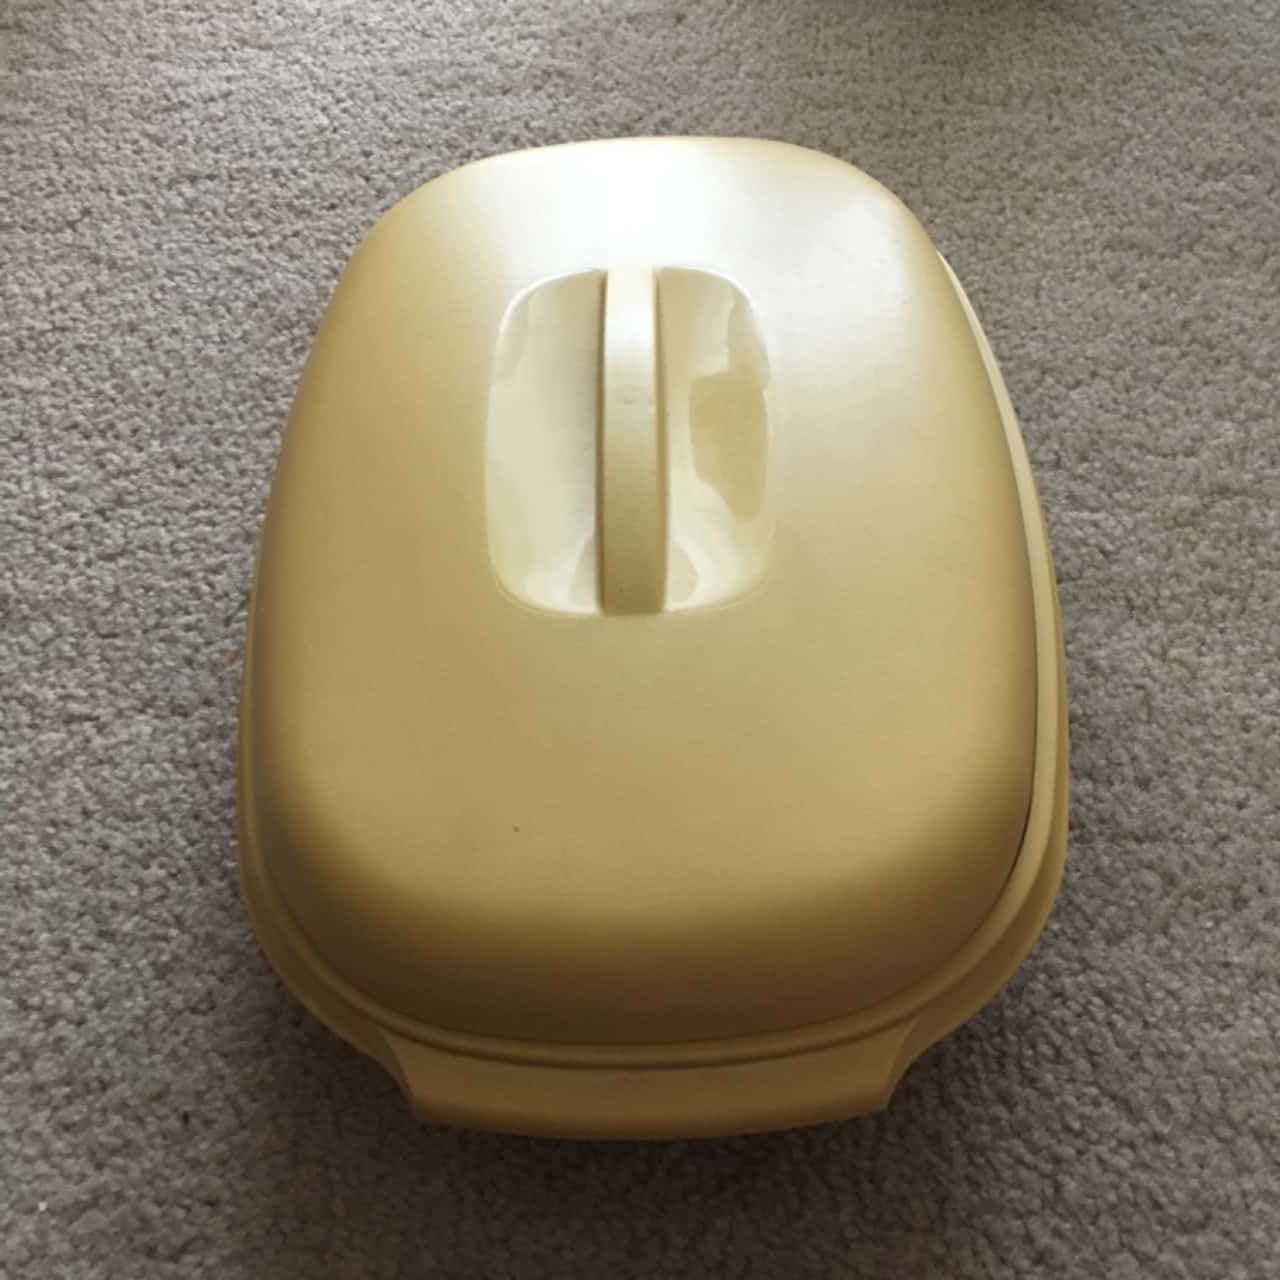 Vintage Tupperware Micro Steamer with White Strainer, Harvest Gold